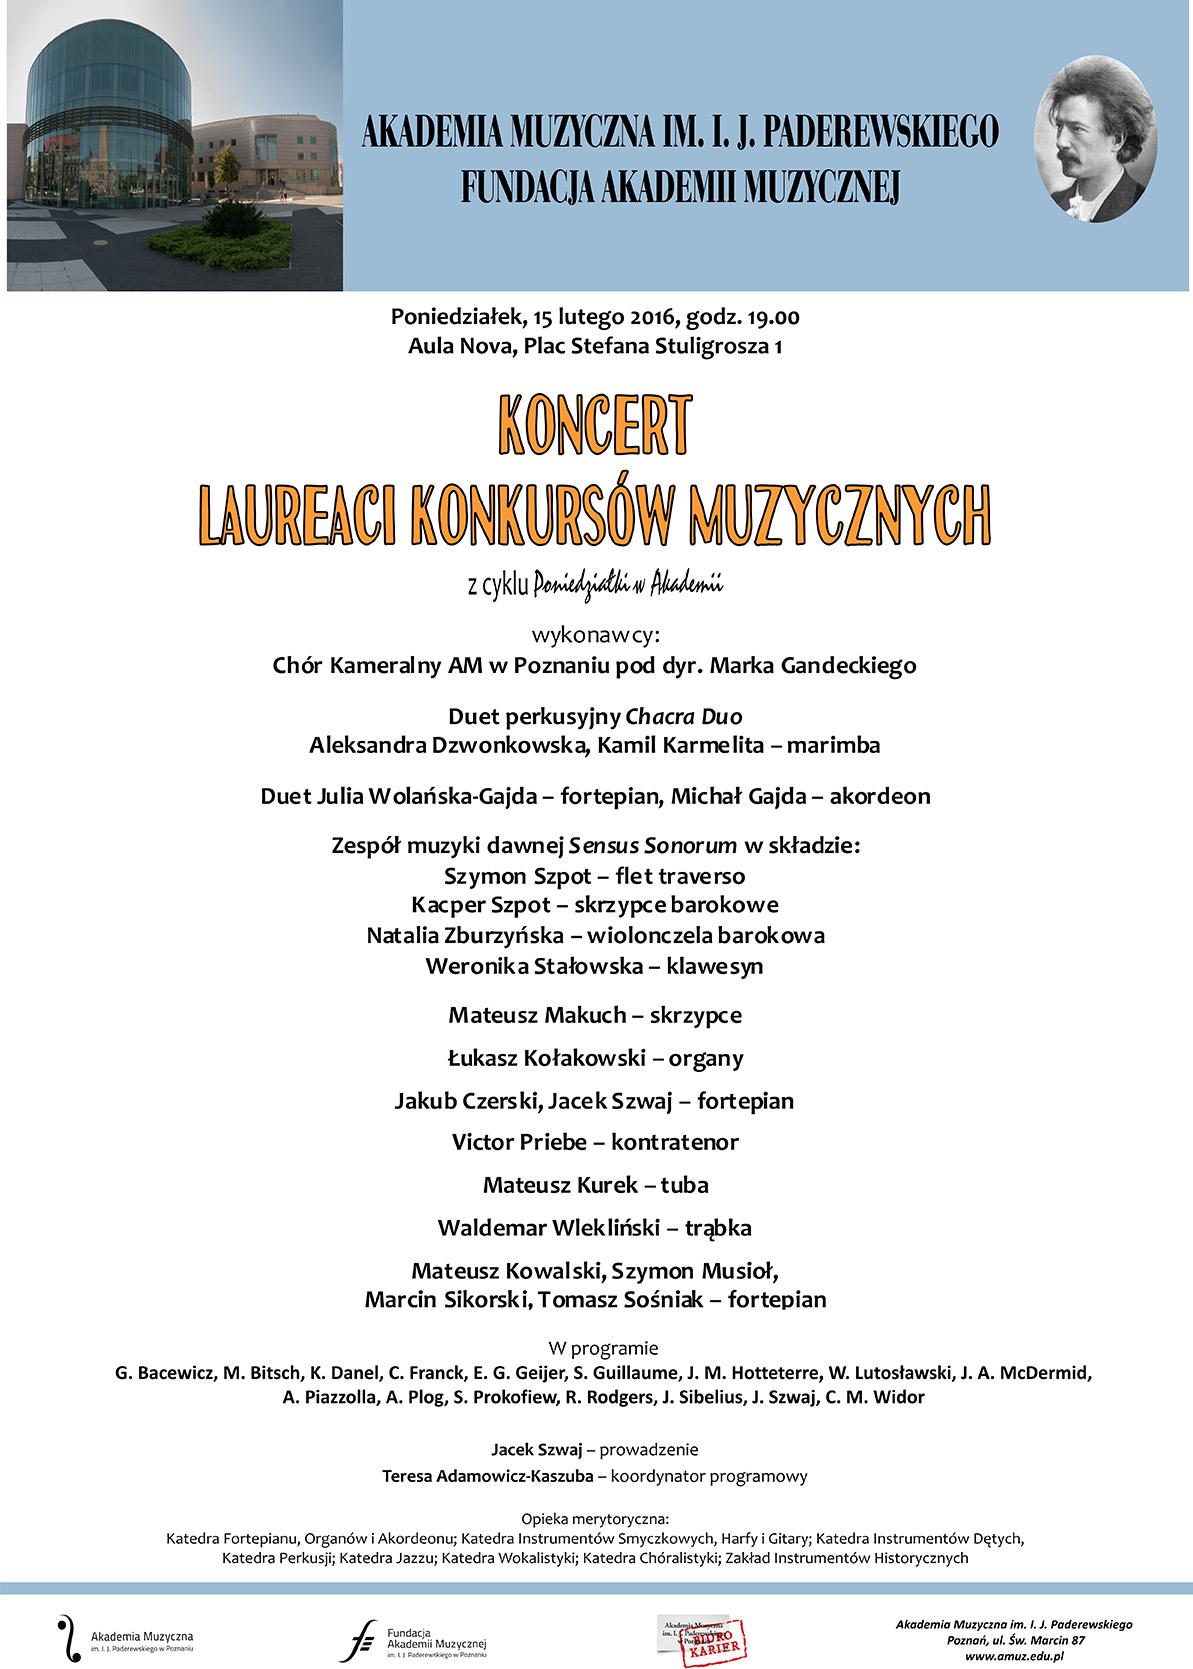 15.02.2016 koncert laureatów (prof. Kaszuba)